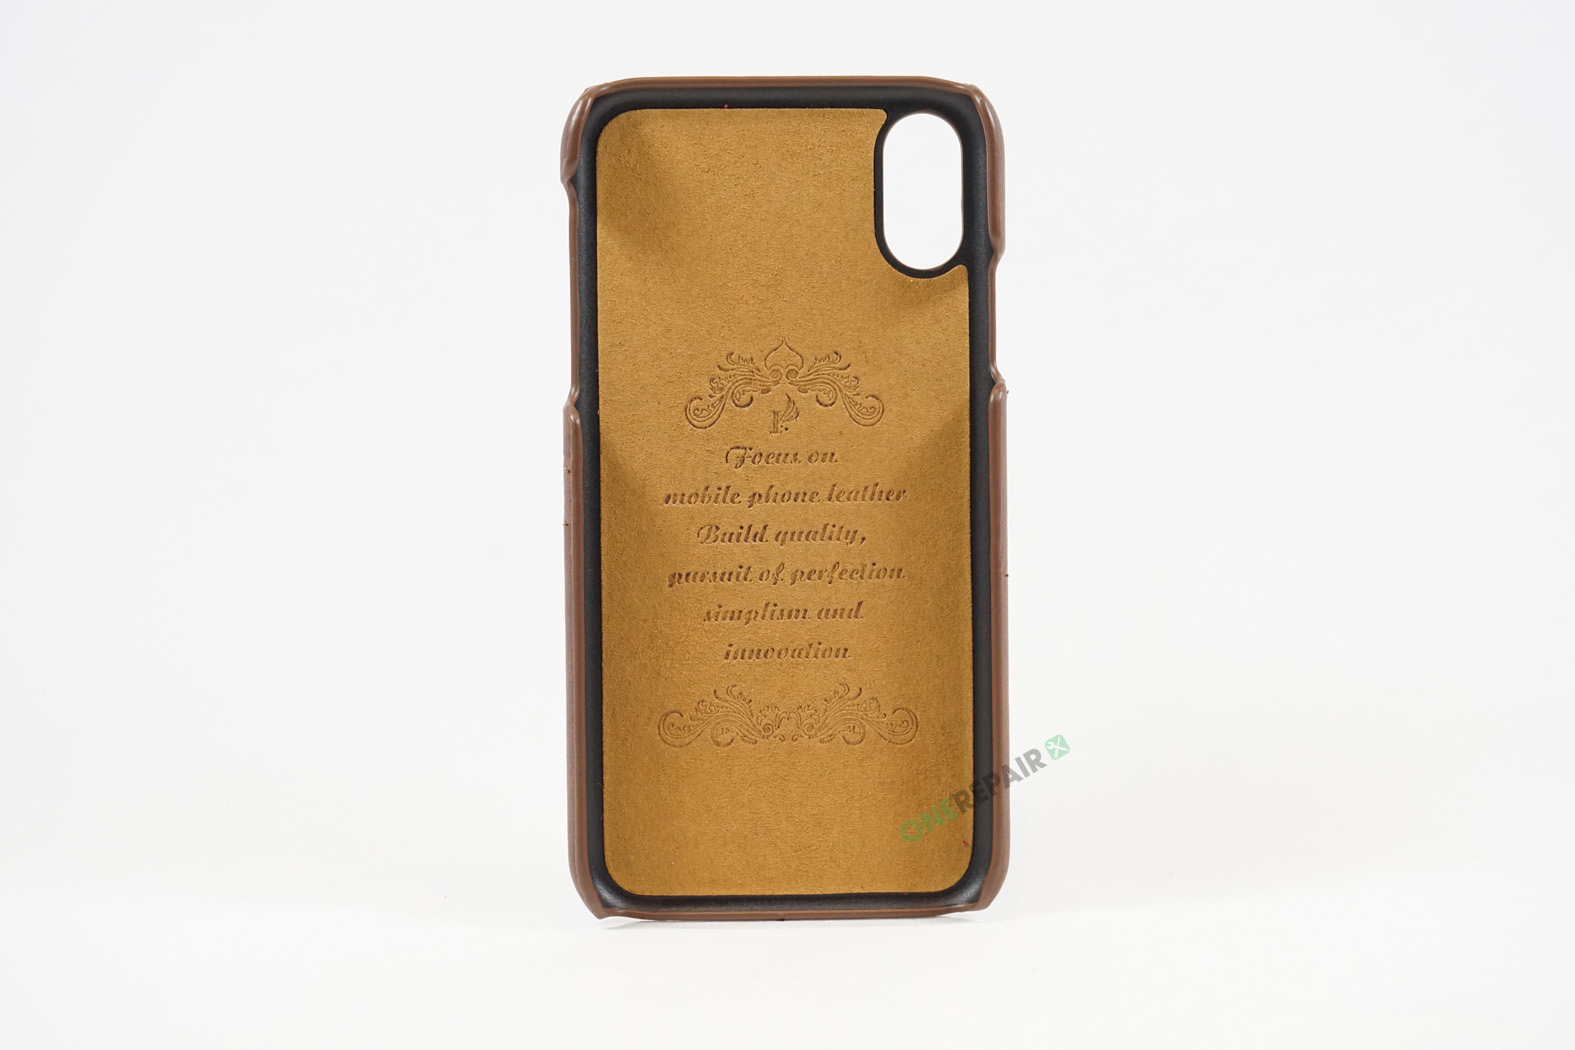 351992_iPhone_Xs_Max_Laeder_Kortholder_Cover_Brun_OneRepair_00003